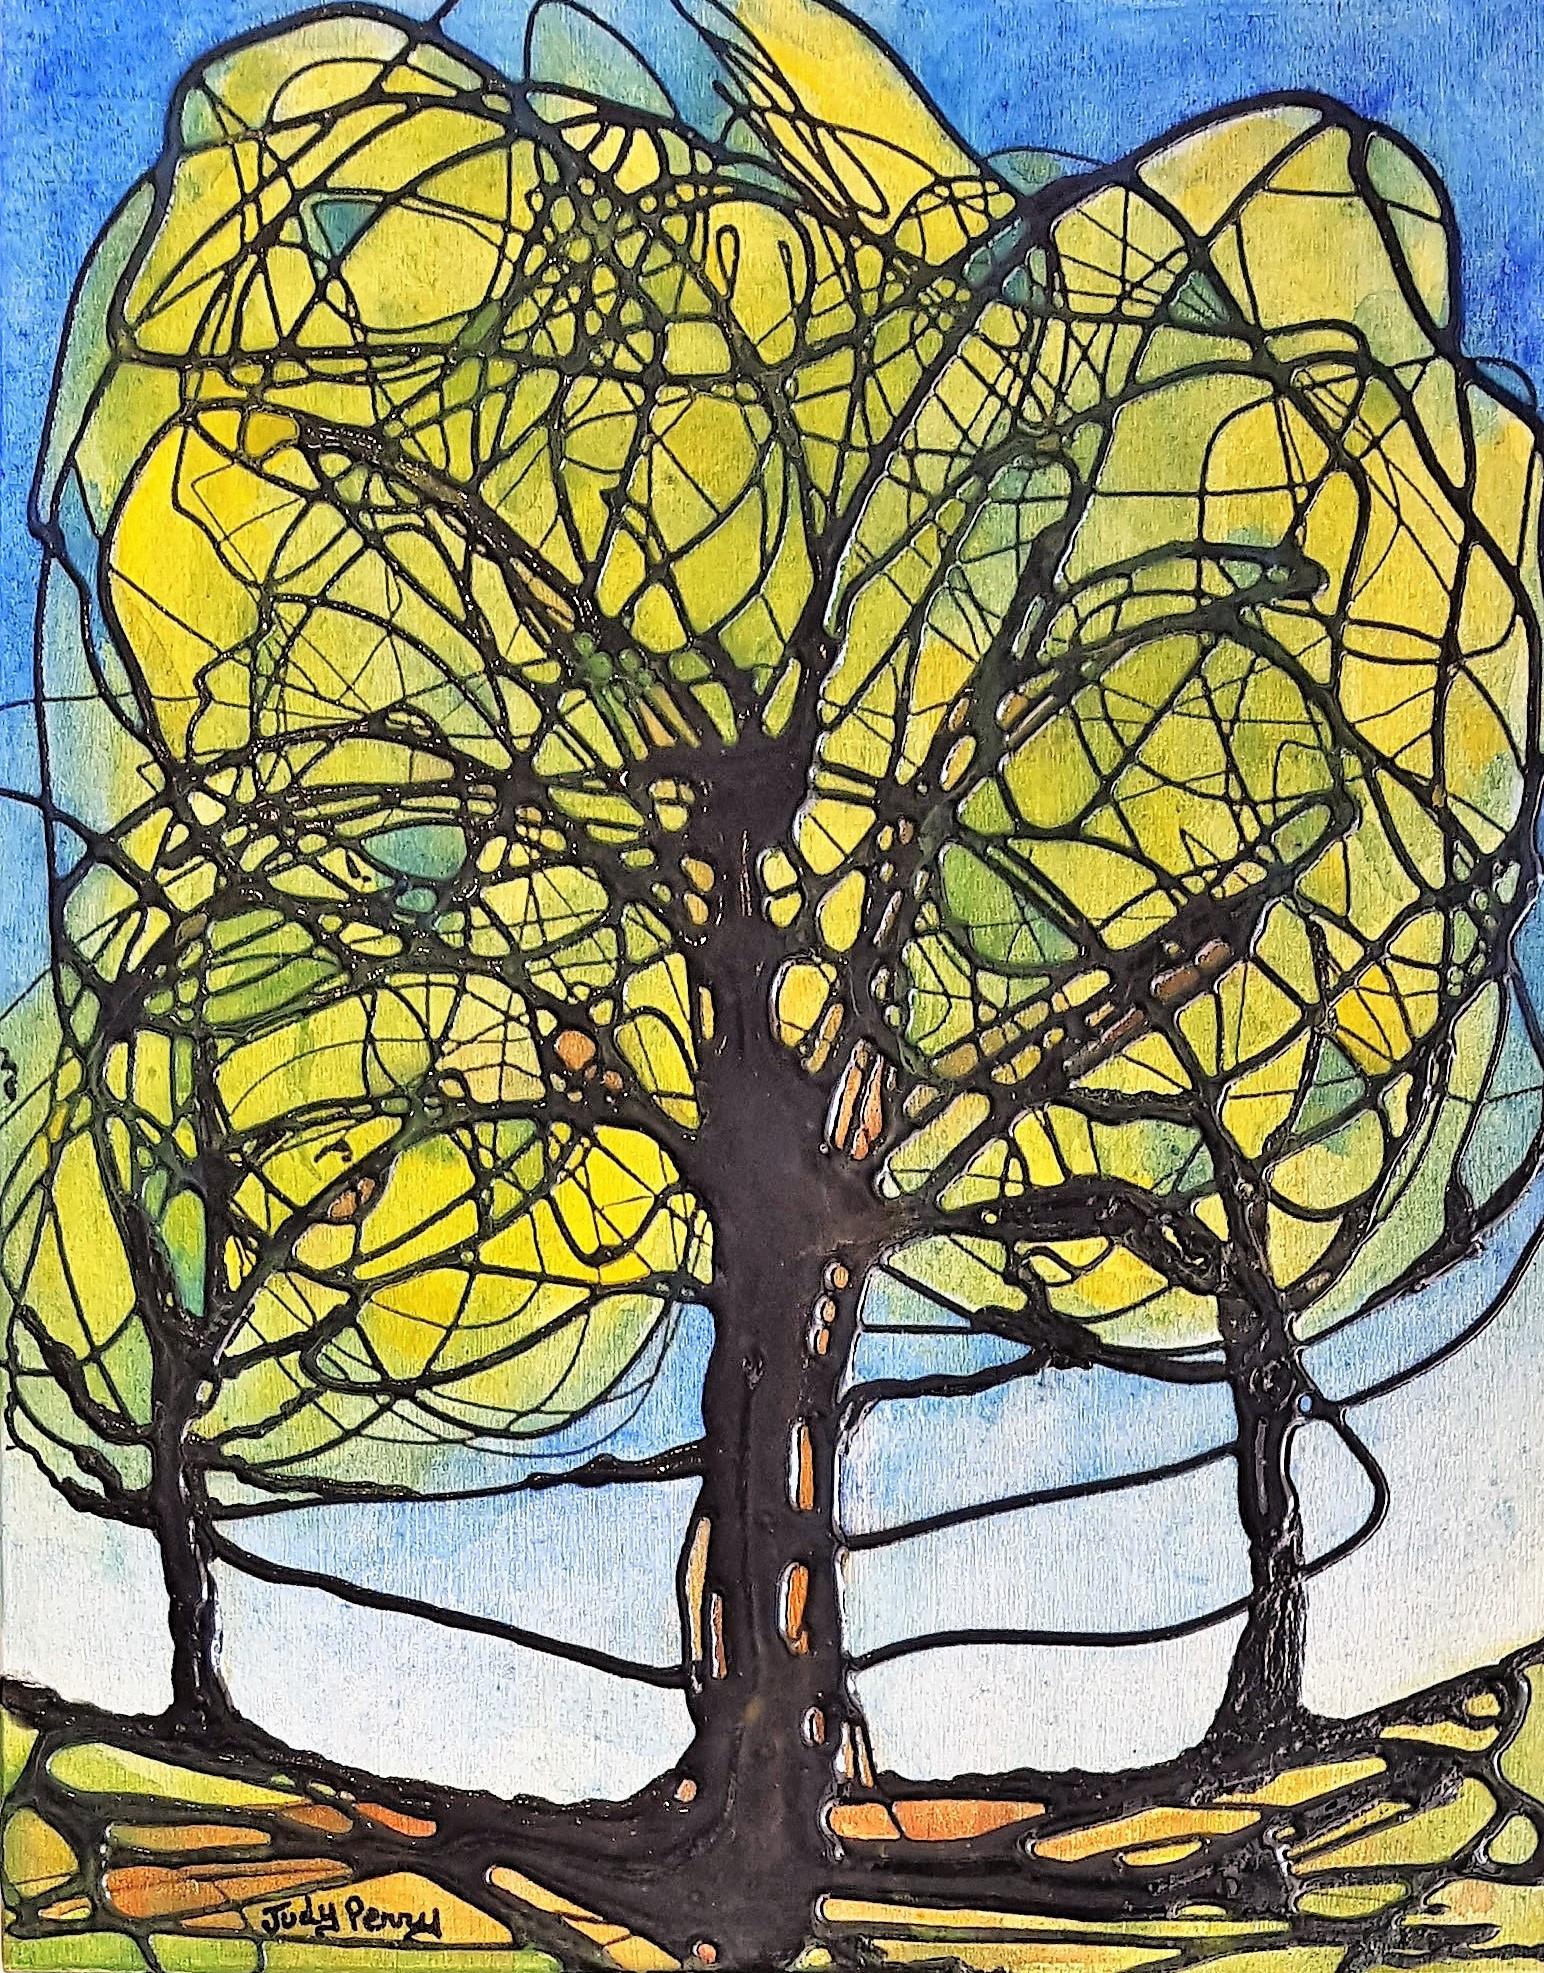 Famiy Tree - 8 x 10 - Sold